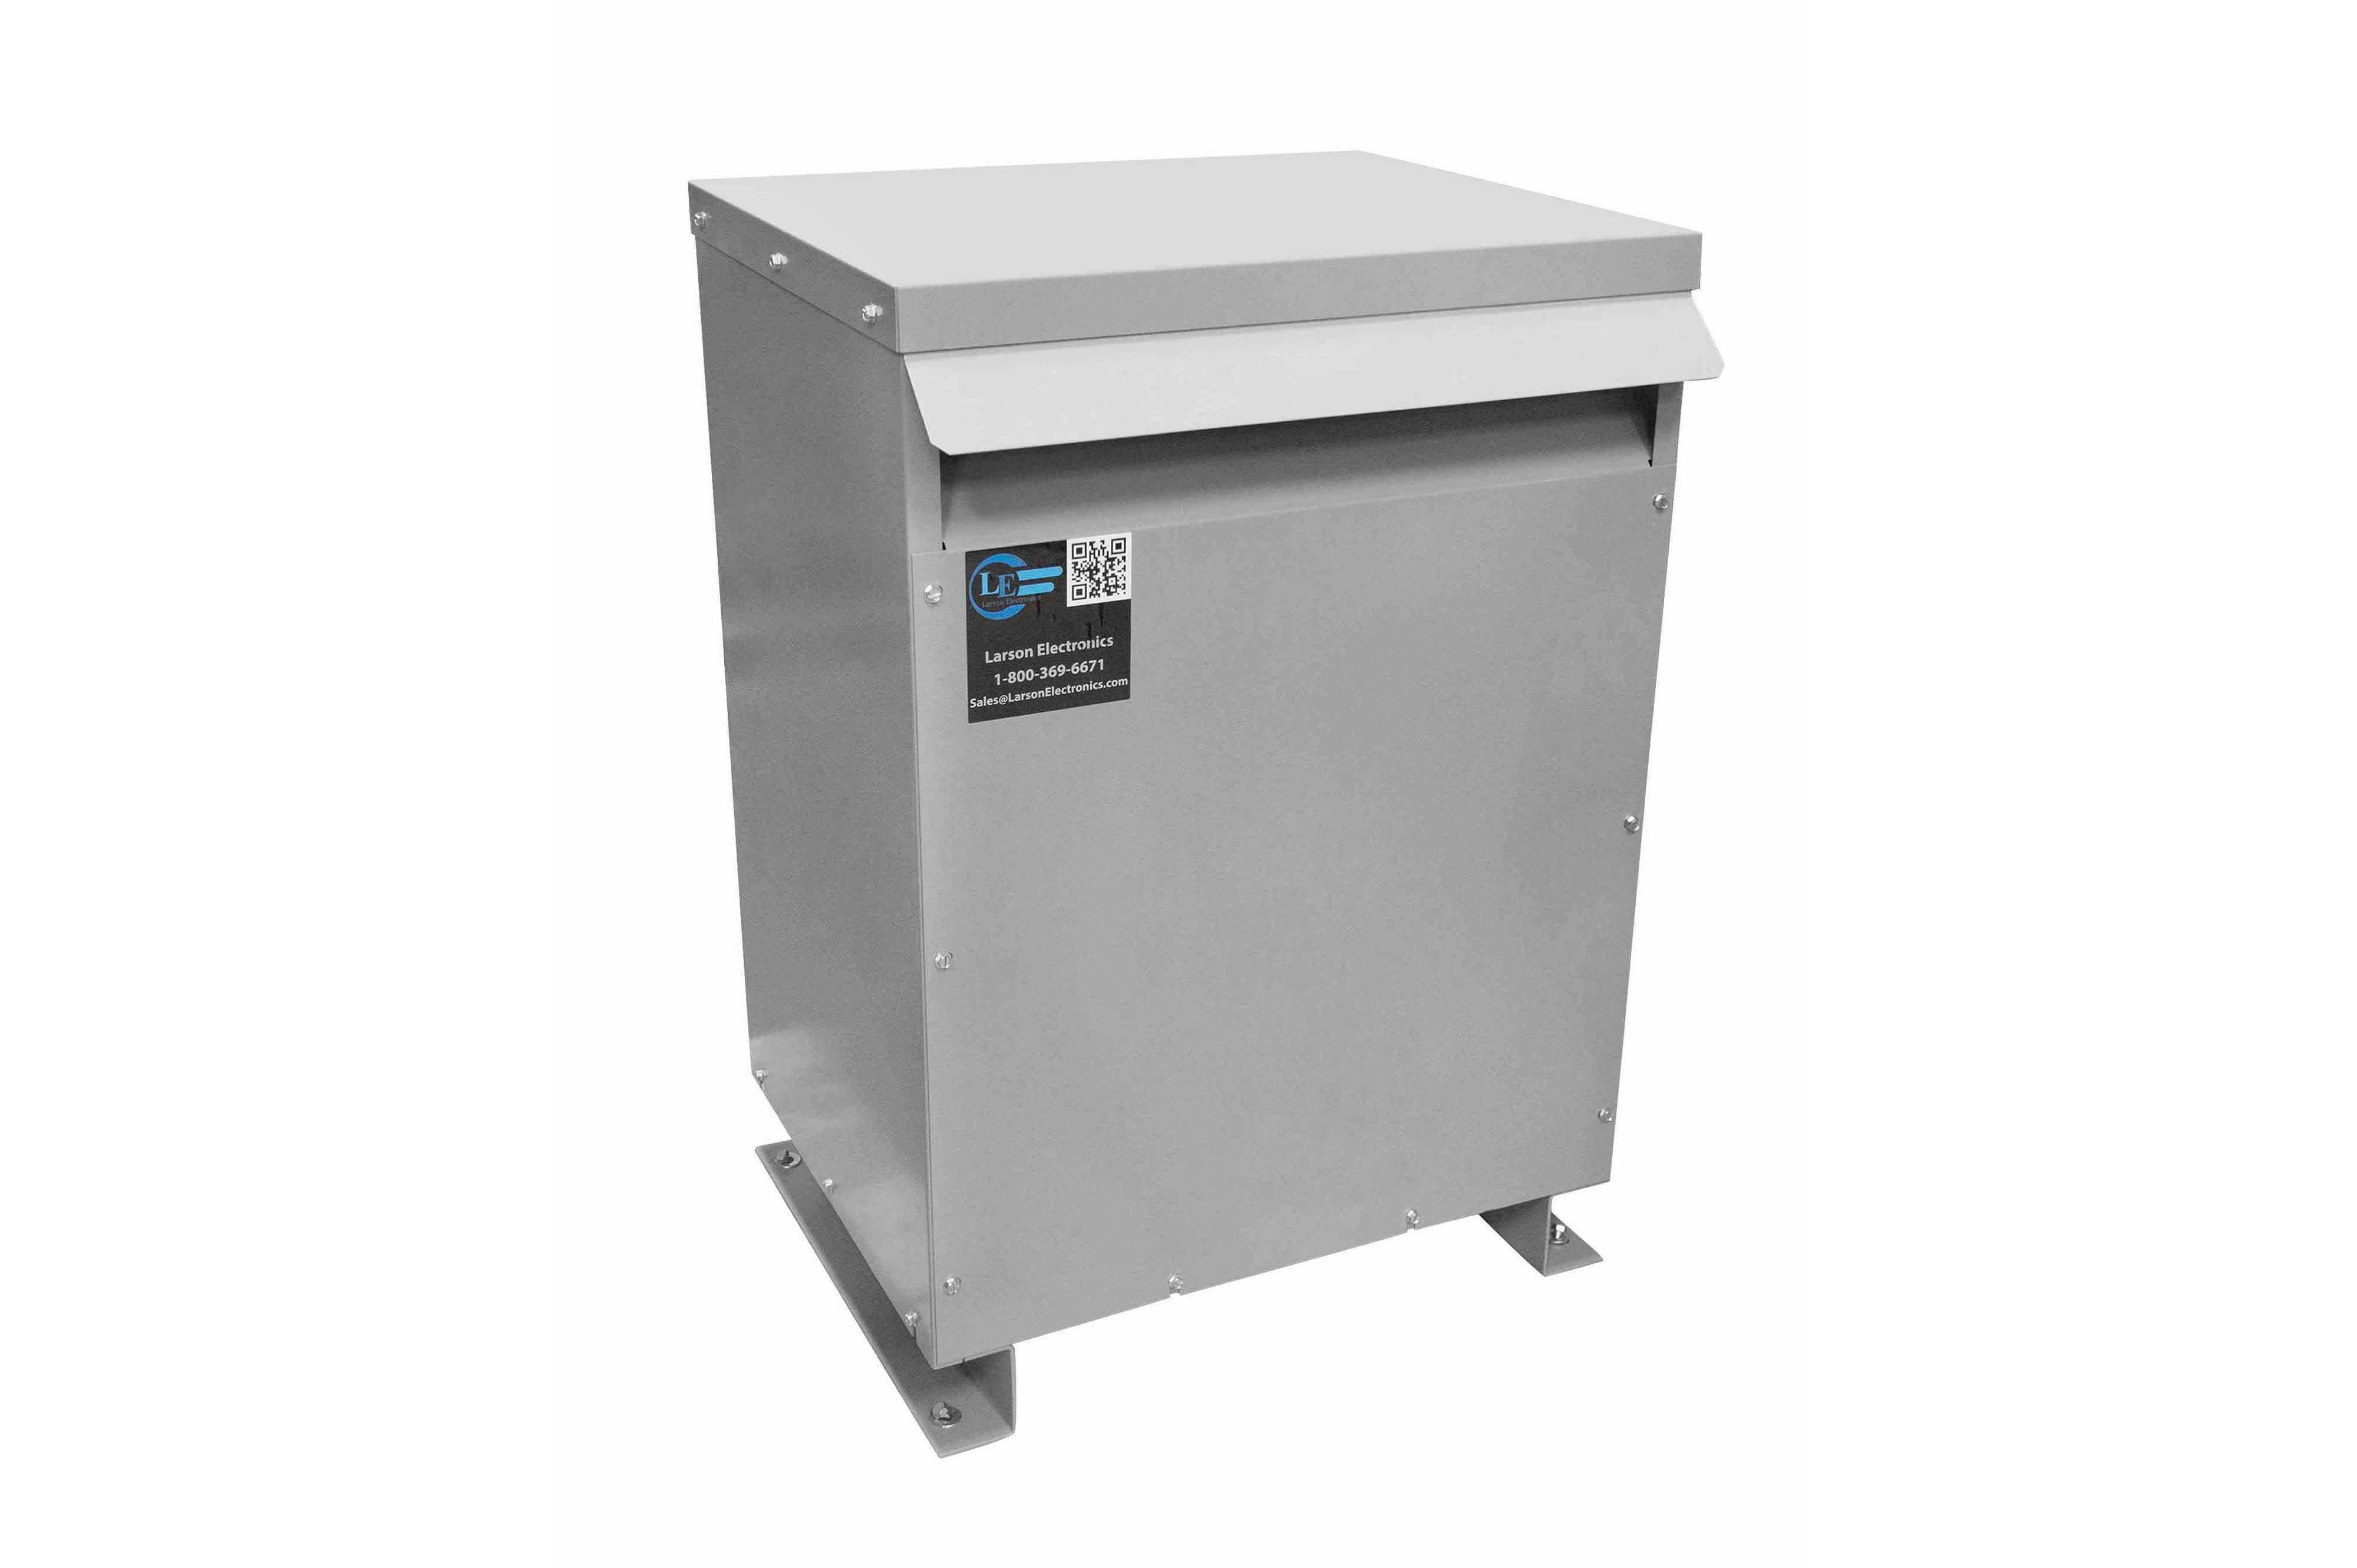 1000 kVA 3PH Isolation Transformer, 440V Wye Primary, 208V Delta Secondary, N3R, Ventilated, 60 Hz